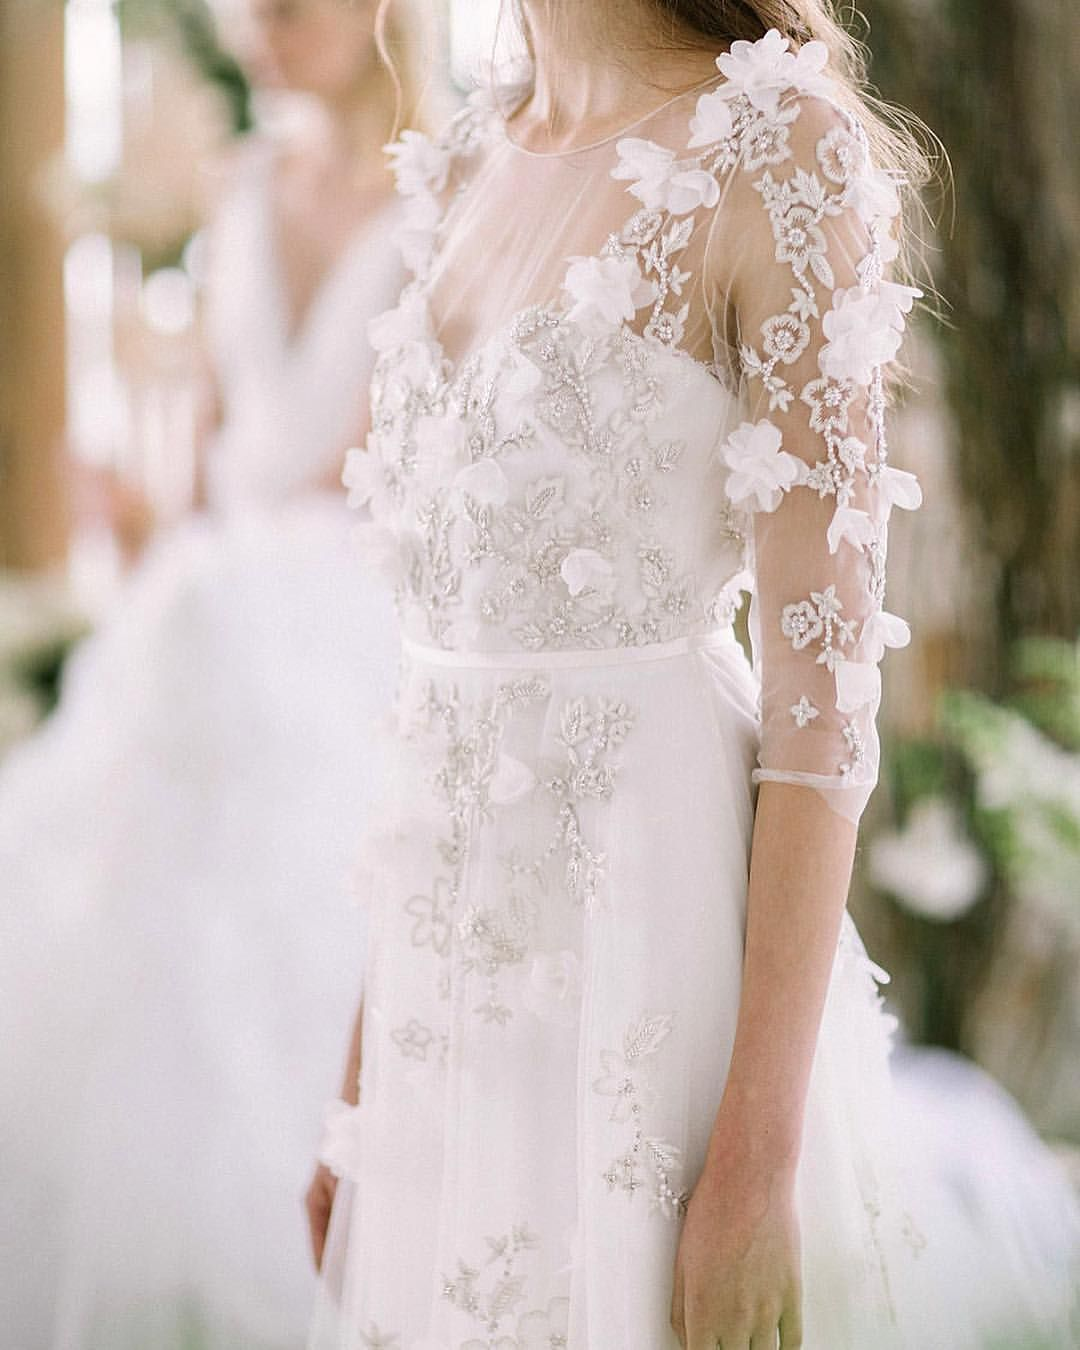 Pin by zurinah husaini on the wedding dress pinterest marchesa